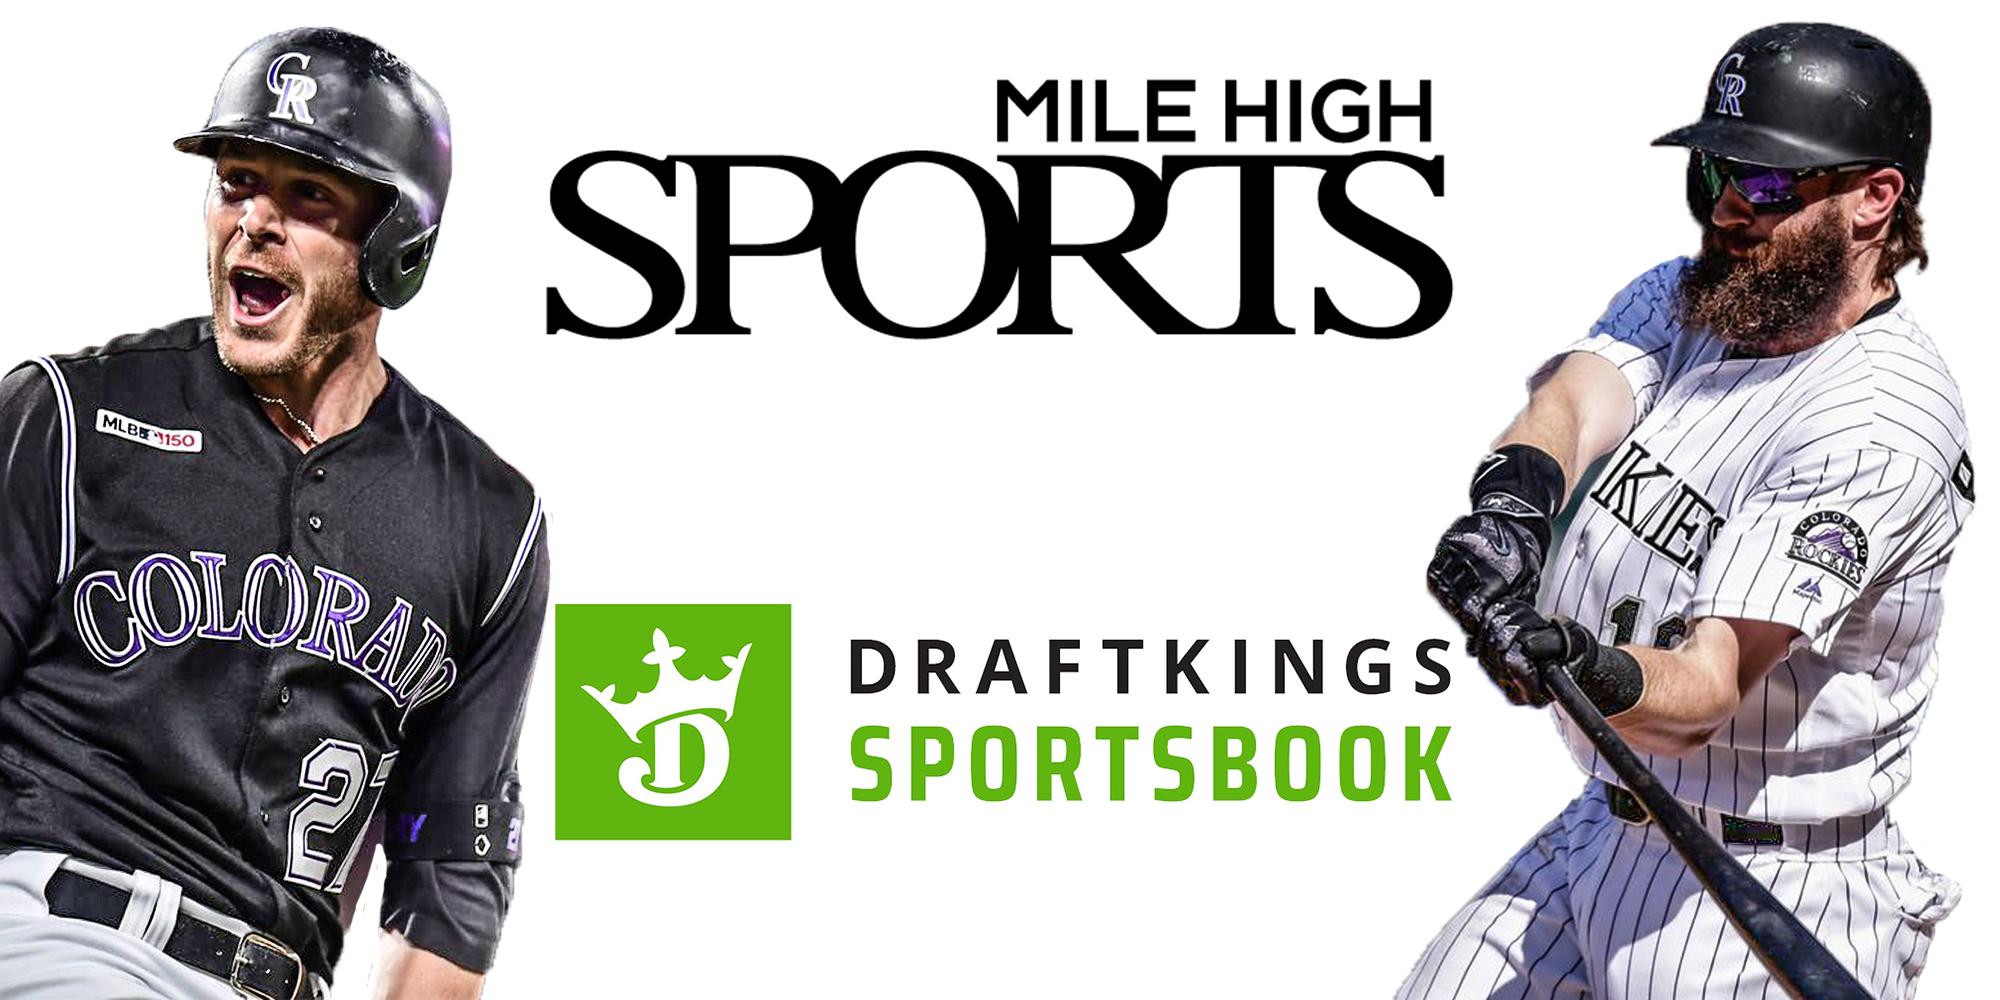 Mile High Sports, DraftKings Sportsbook Colorado, MLB-Colorado Rockies Futures, Trevor Story, Charlie Blackmon